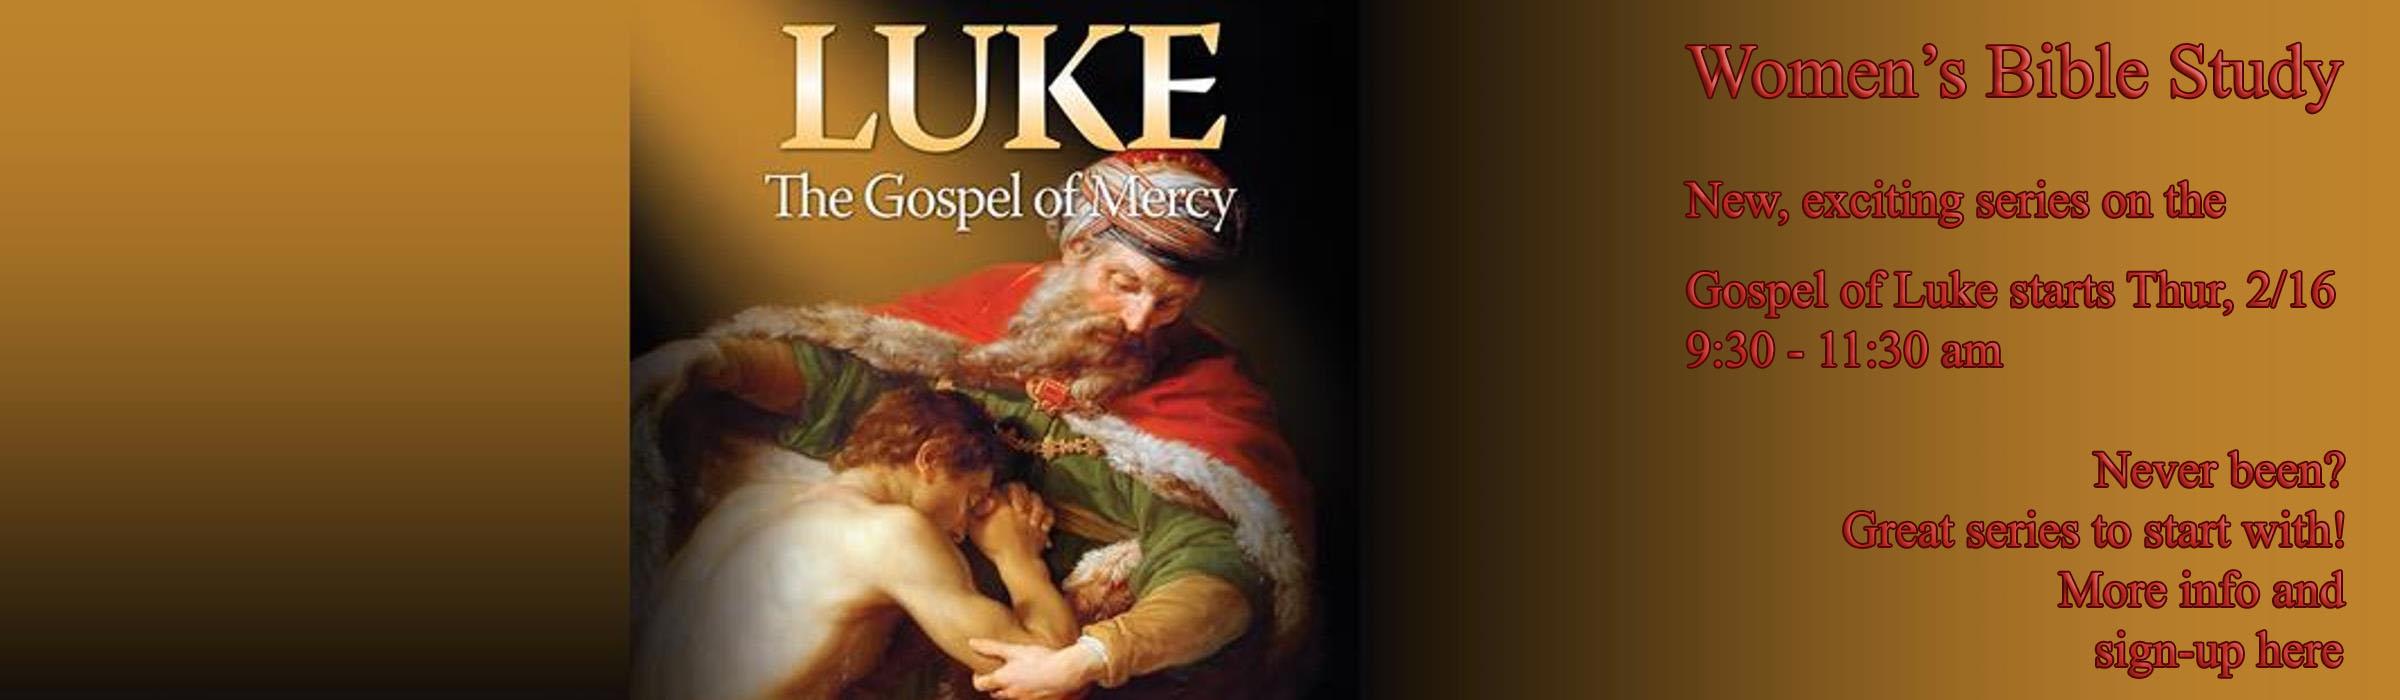 luke womens bible study slider 2-17